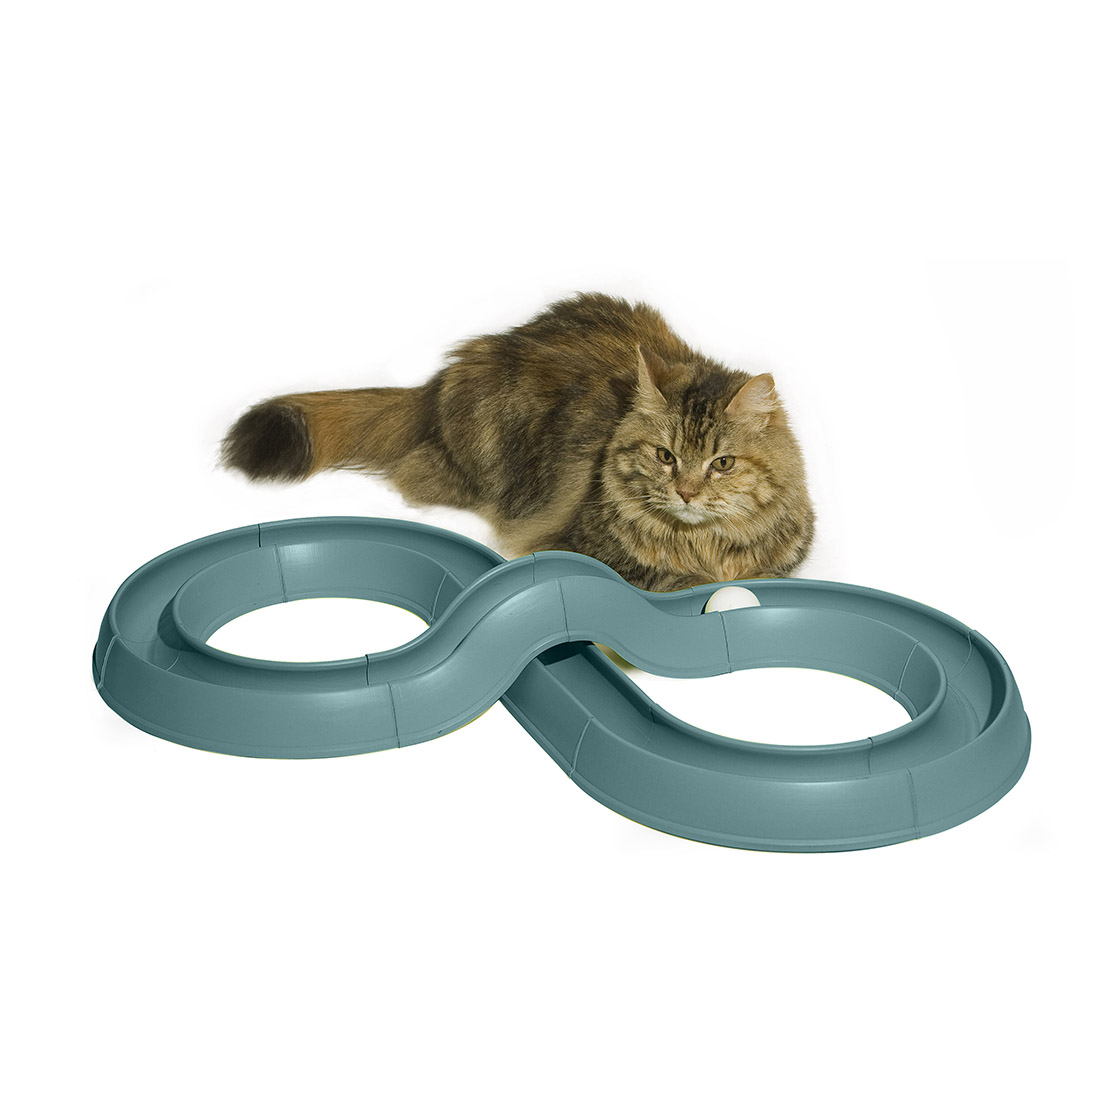 Turbo Track Cat Toy Image